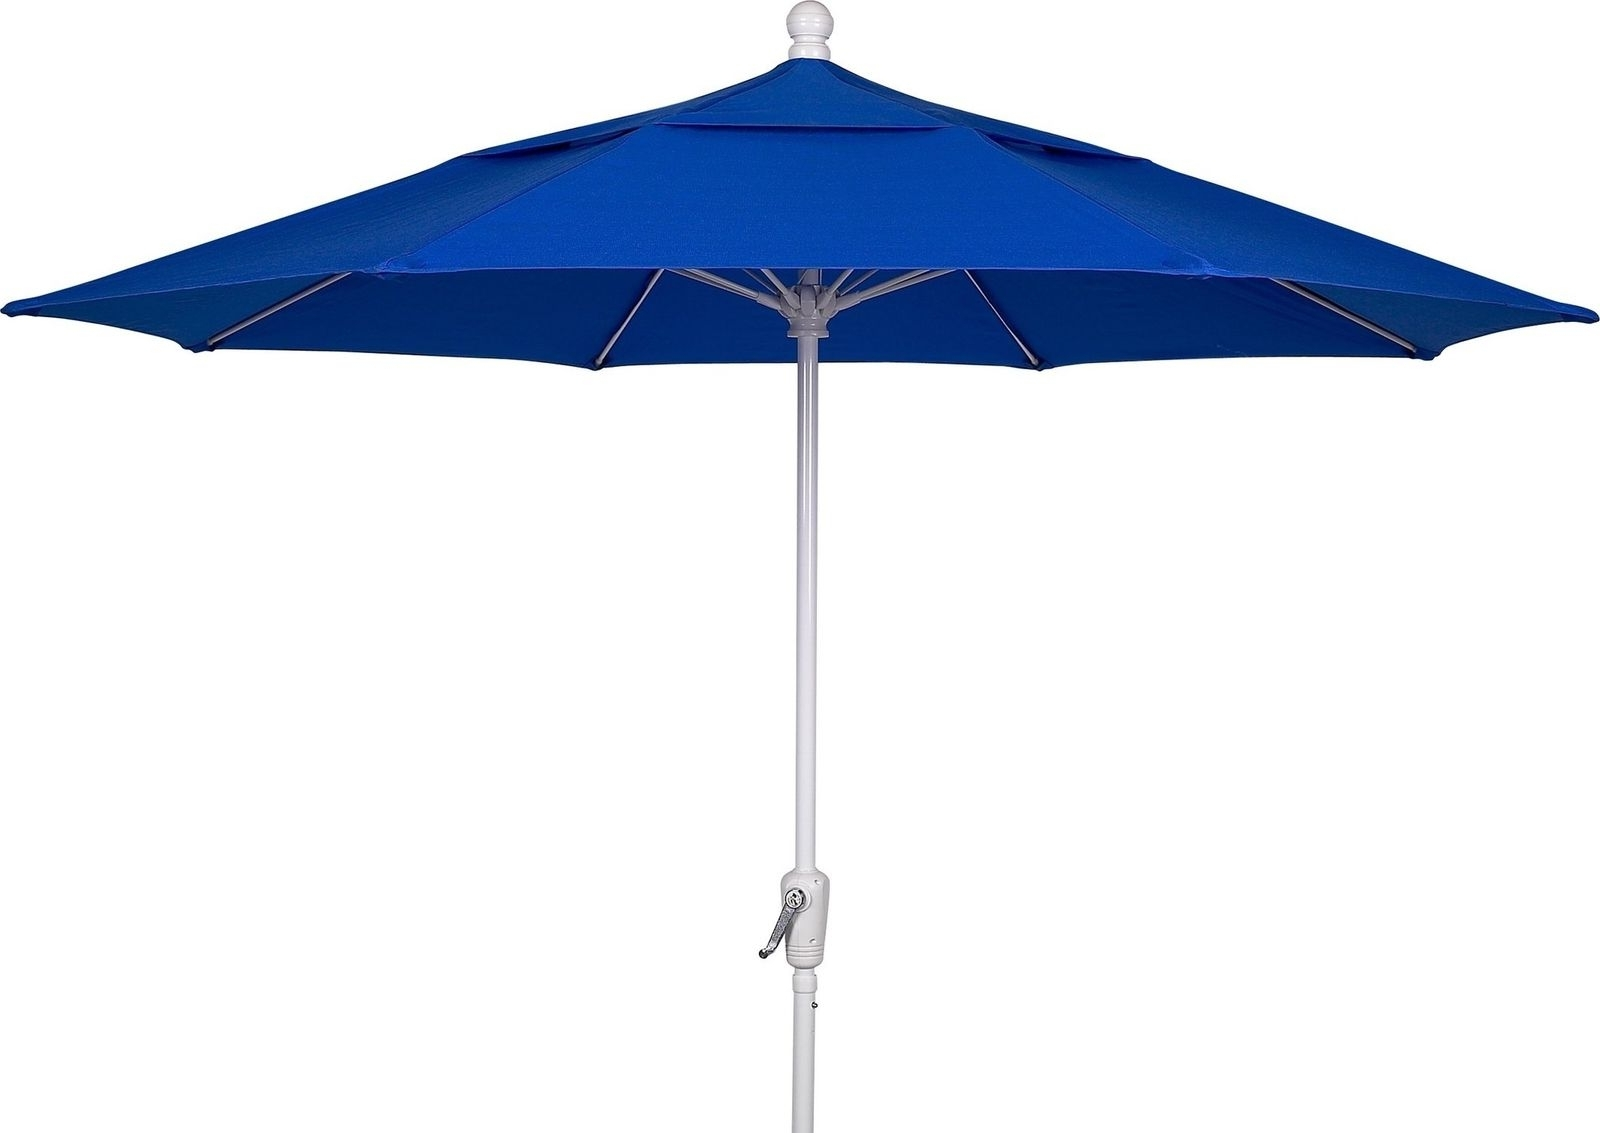 Fiberbuilt Umbrellas Patio Umbrella  (View 10 of 20)